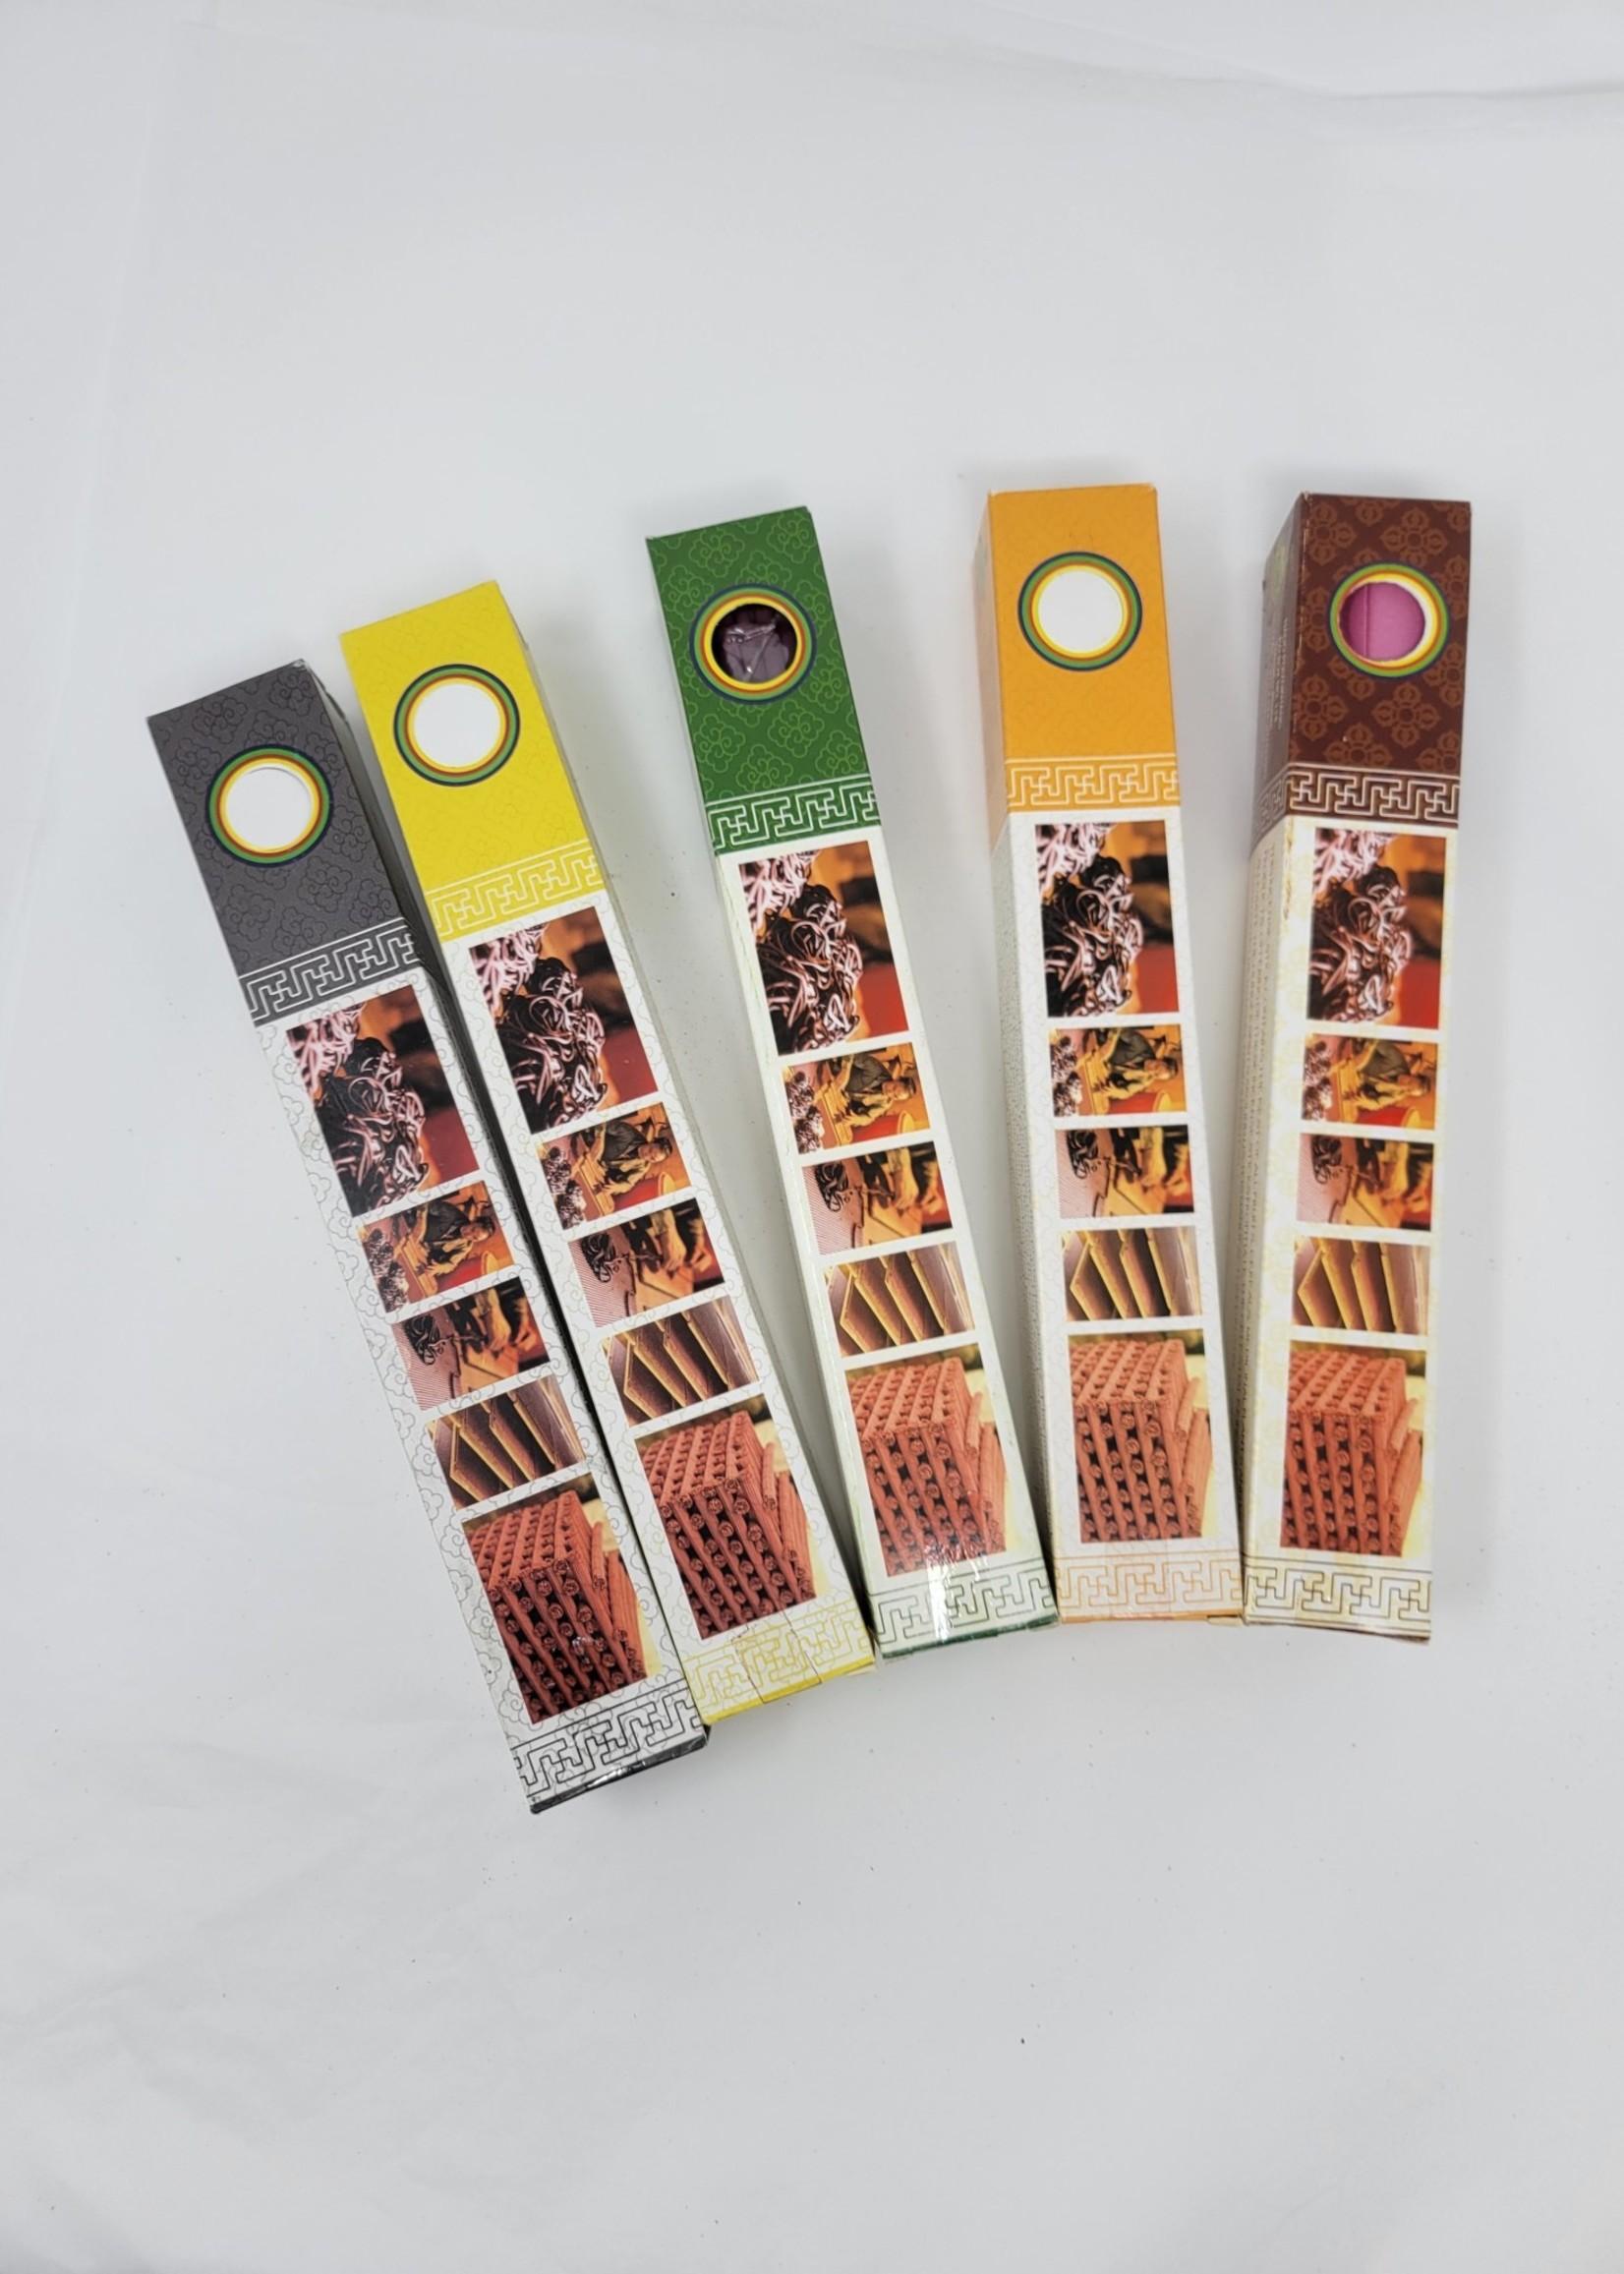 Nado Poizokhang Incense